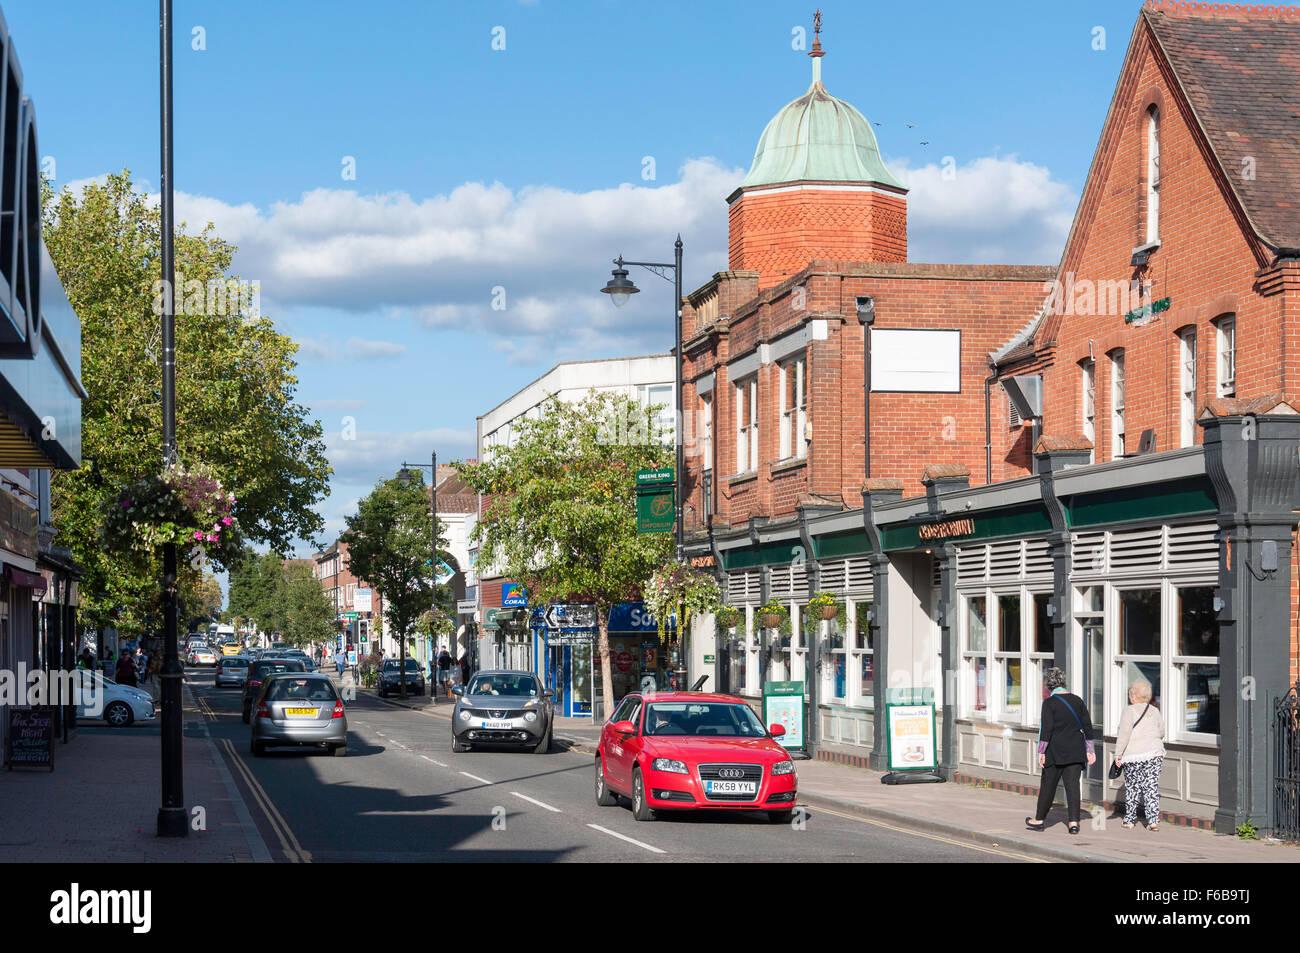 Town Centre, Fleet Road, Fleet, Hampshire, England, United Kingdom - Stock Image